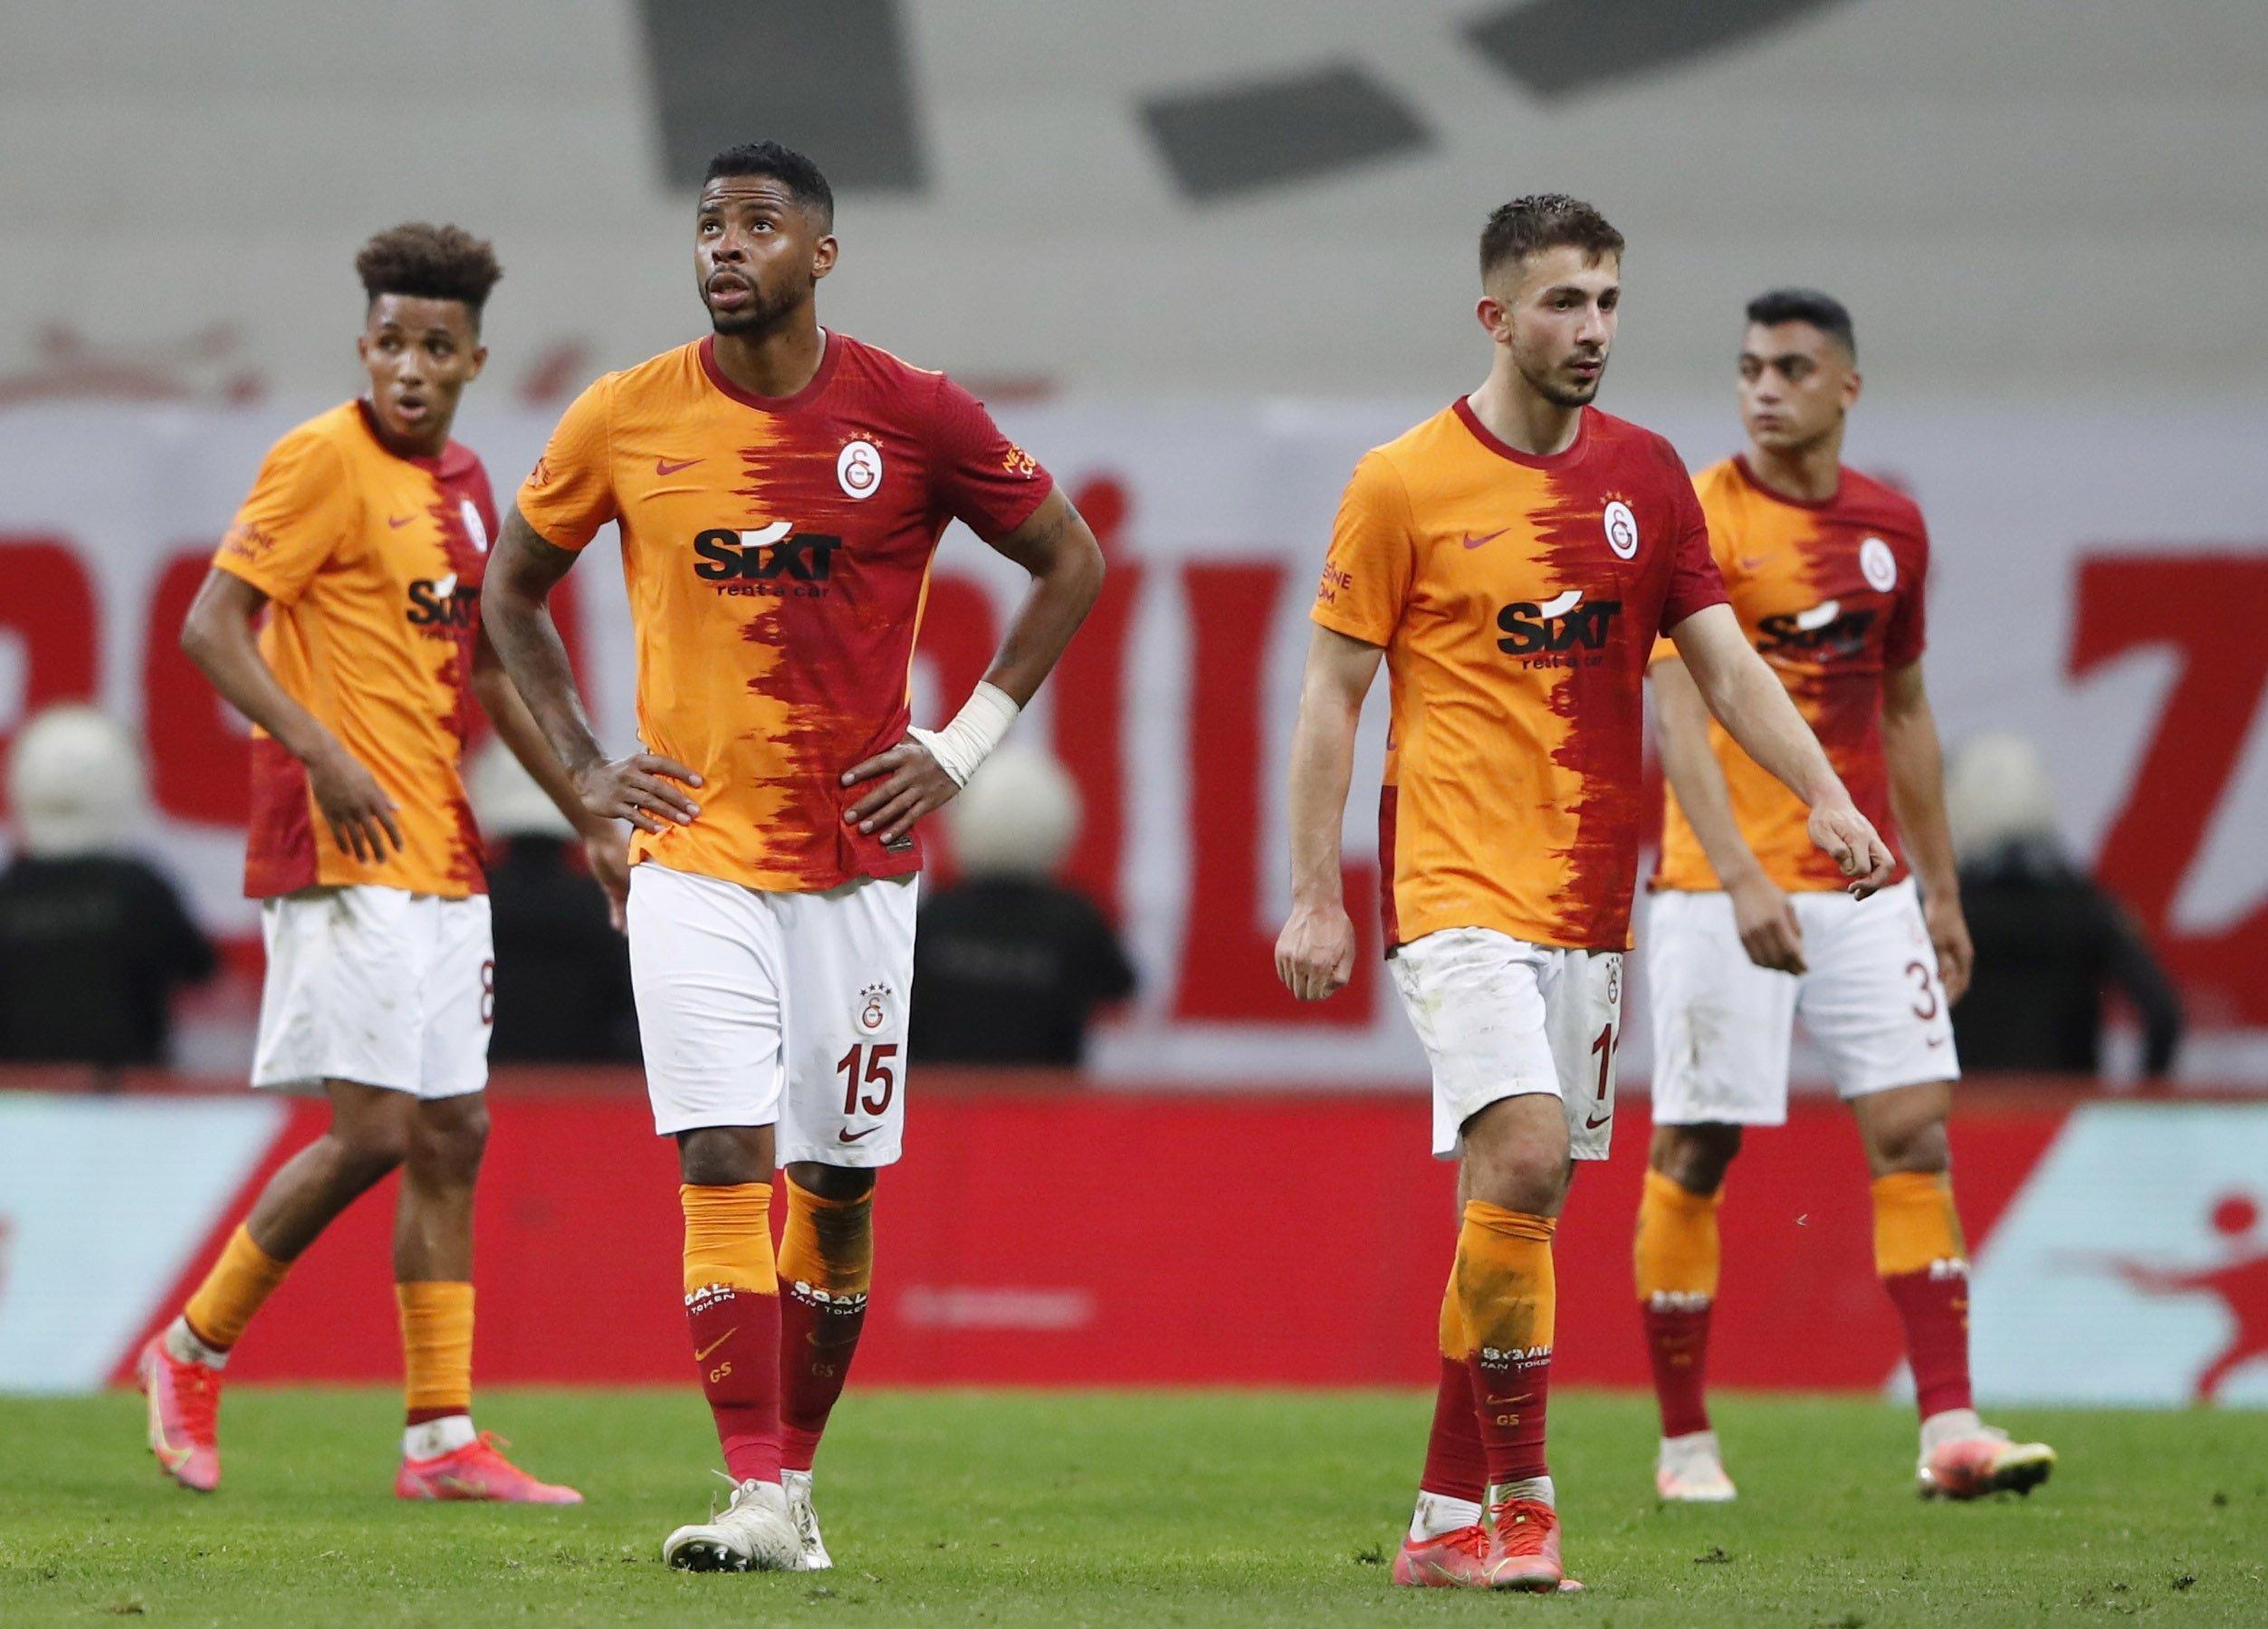 Galatasaray players react after the Turkish Süper Lig match against Yeni Malatyaspor at Türk Telekom Stadium, Istanbul, Turkey, May 15, 2021. (Reuters Photo)